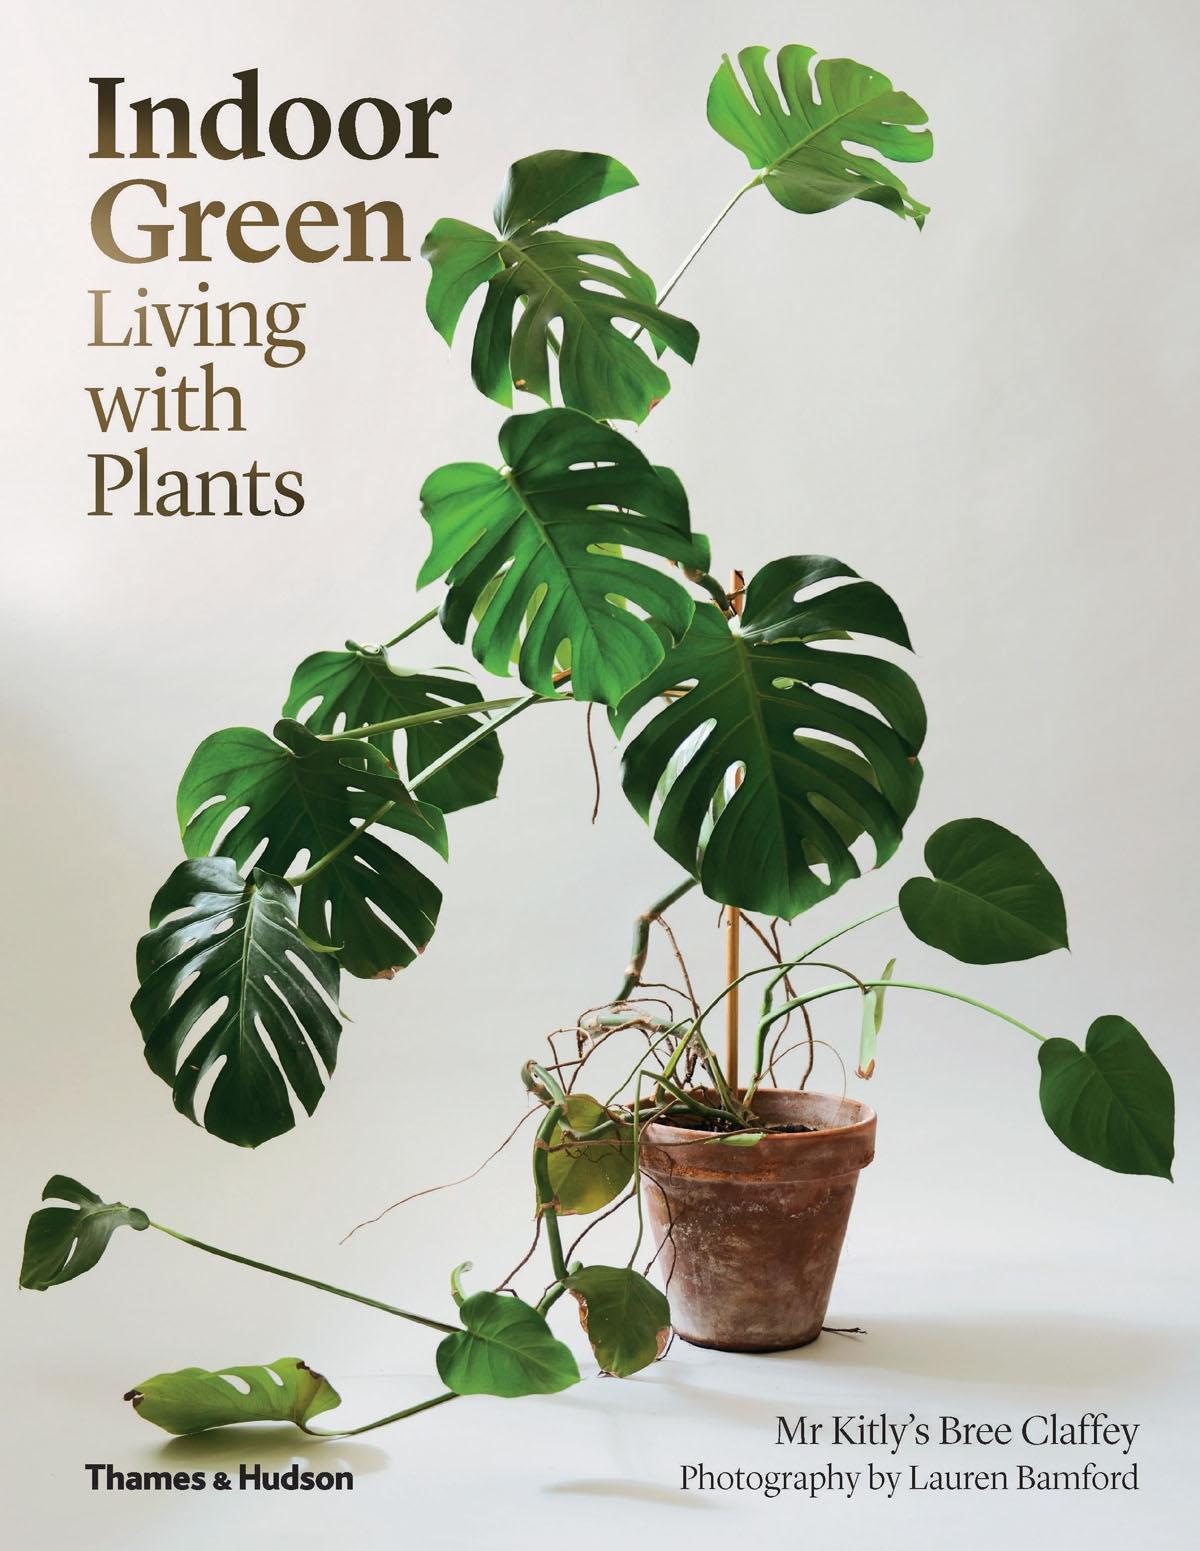 Indoor Green: Living with Plants